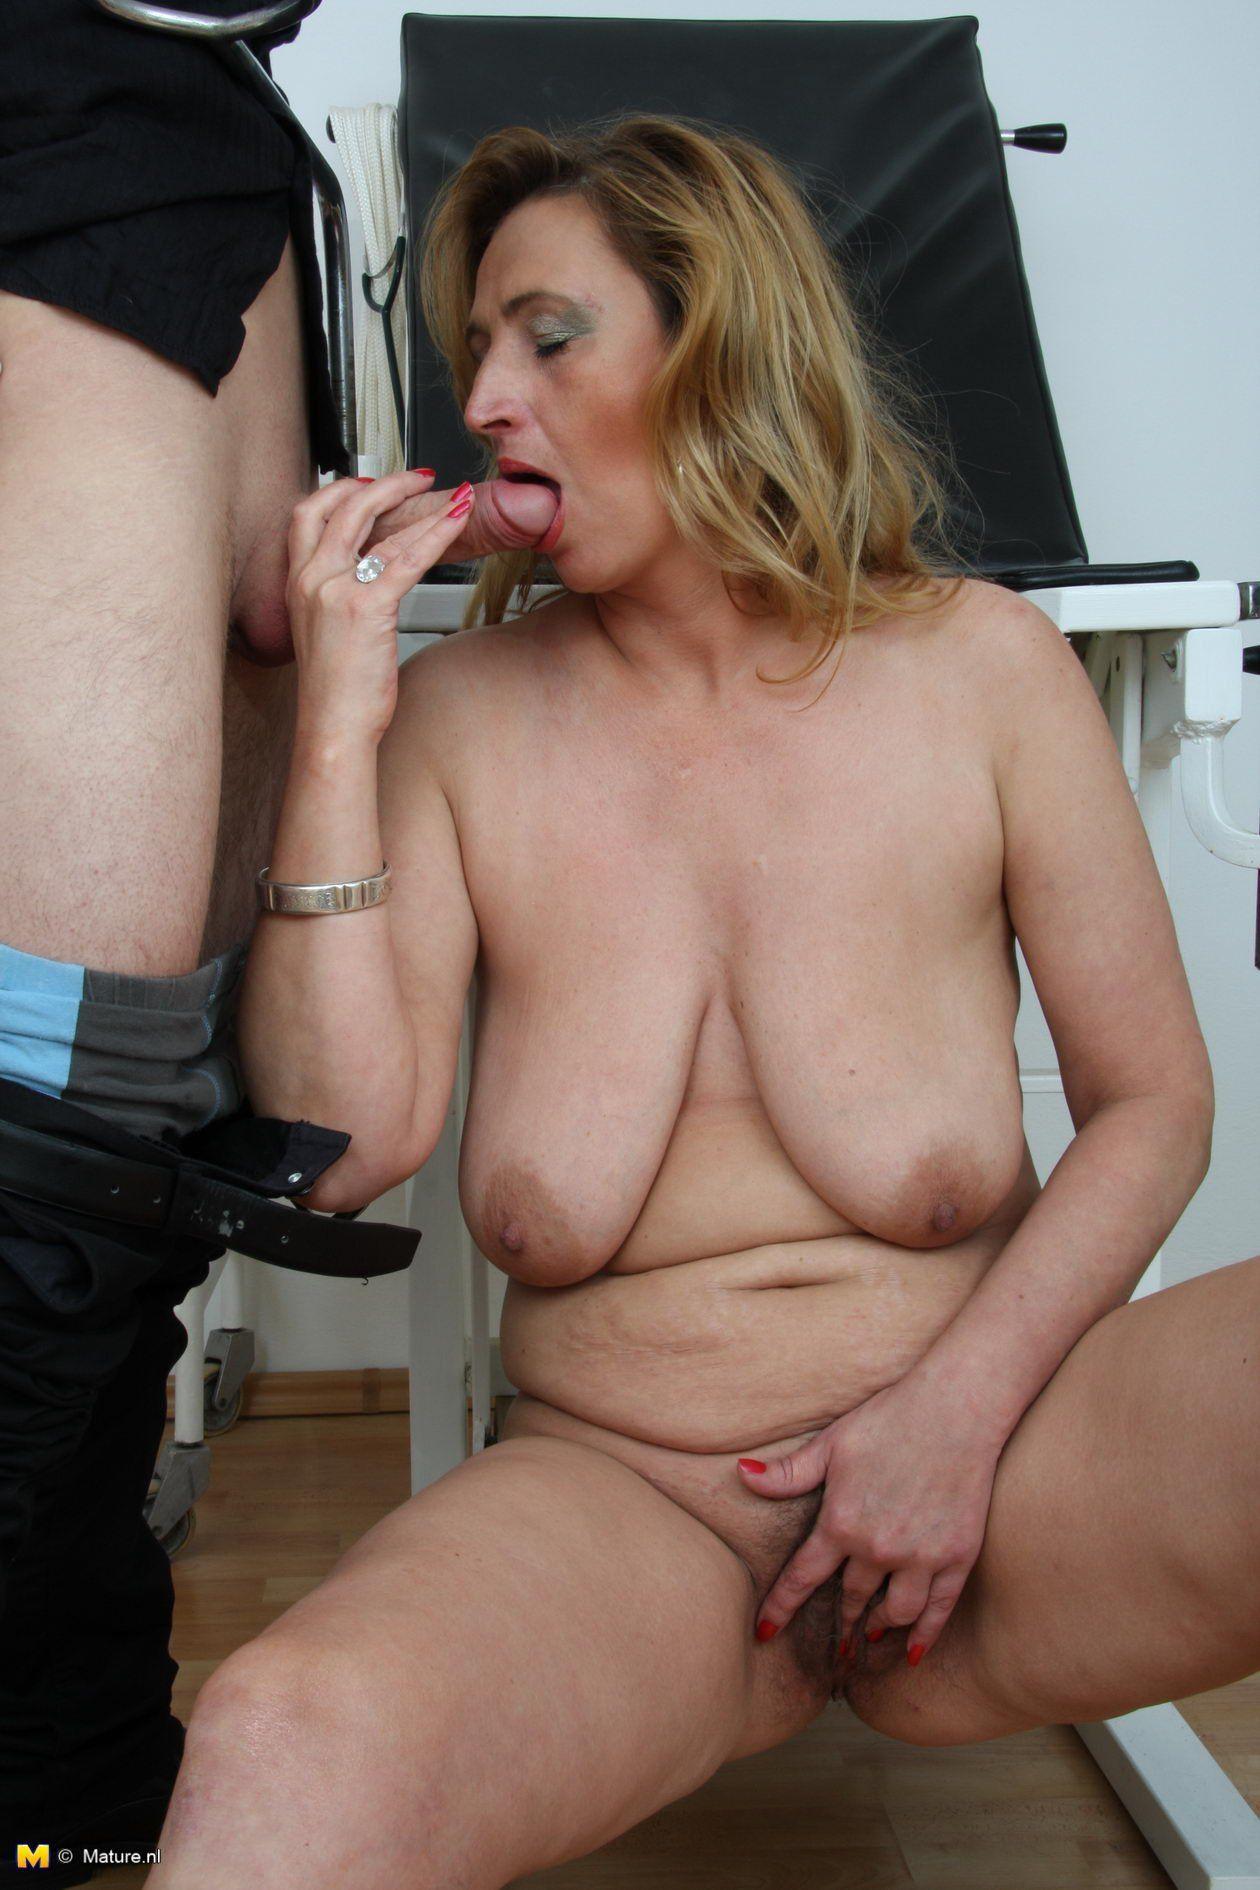 With you Free nude photos mature slut